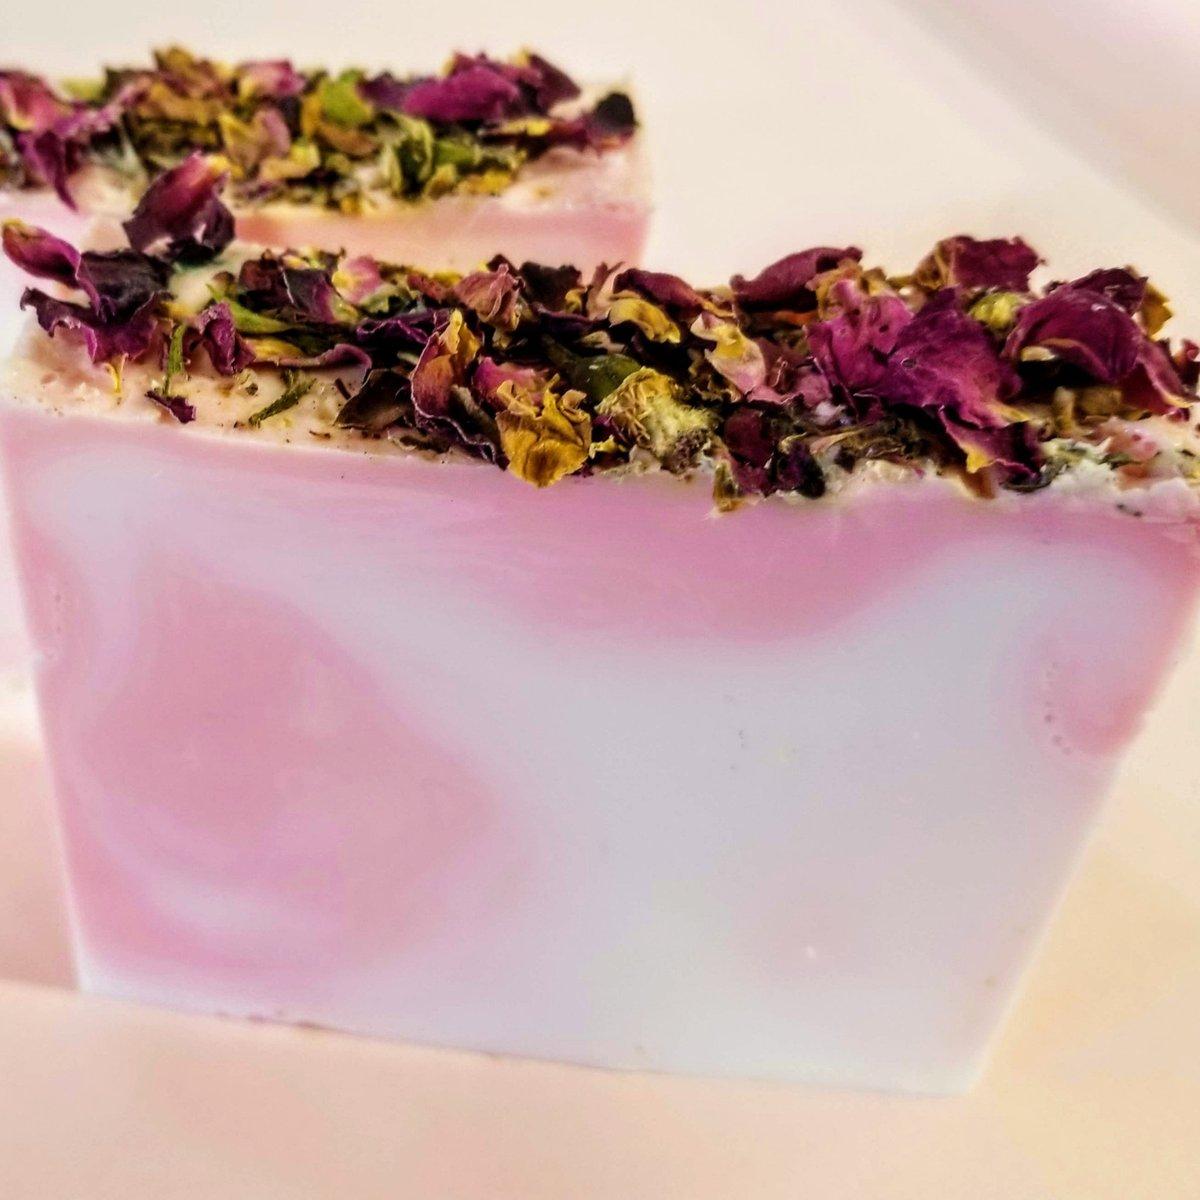 Rose Soap, Rose Petal Soap,Vegan Soap, Natural Soap, Glycerin Soap, Soap Bar, Soap Gift, Christmas Gift, Flower Soap, Soap Favors, Soap Sale  #Etsy #NaturalSoap #Soap #Handmade #DeShawnMarie #ColdProcess #Gifts #PinkSoap